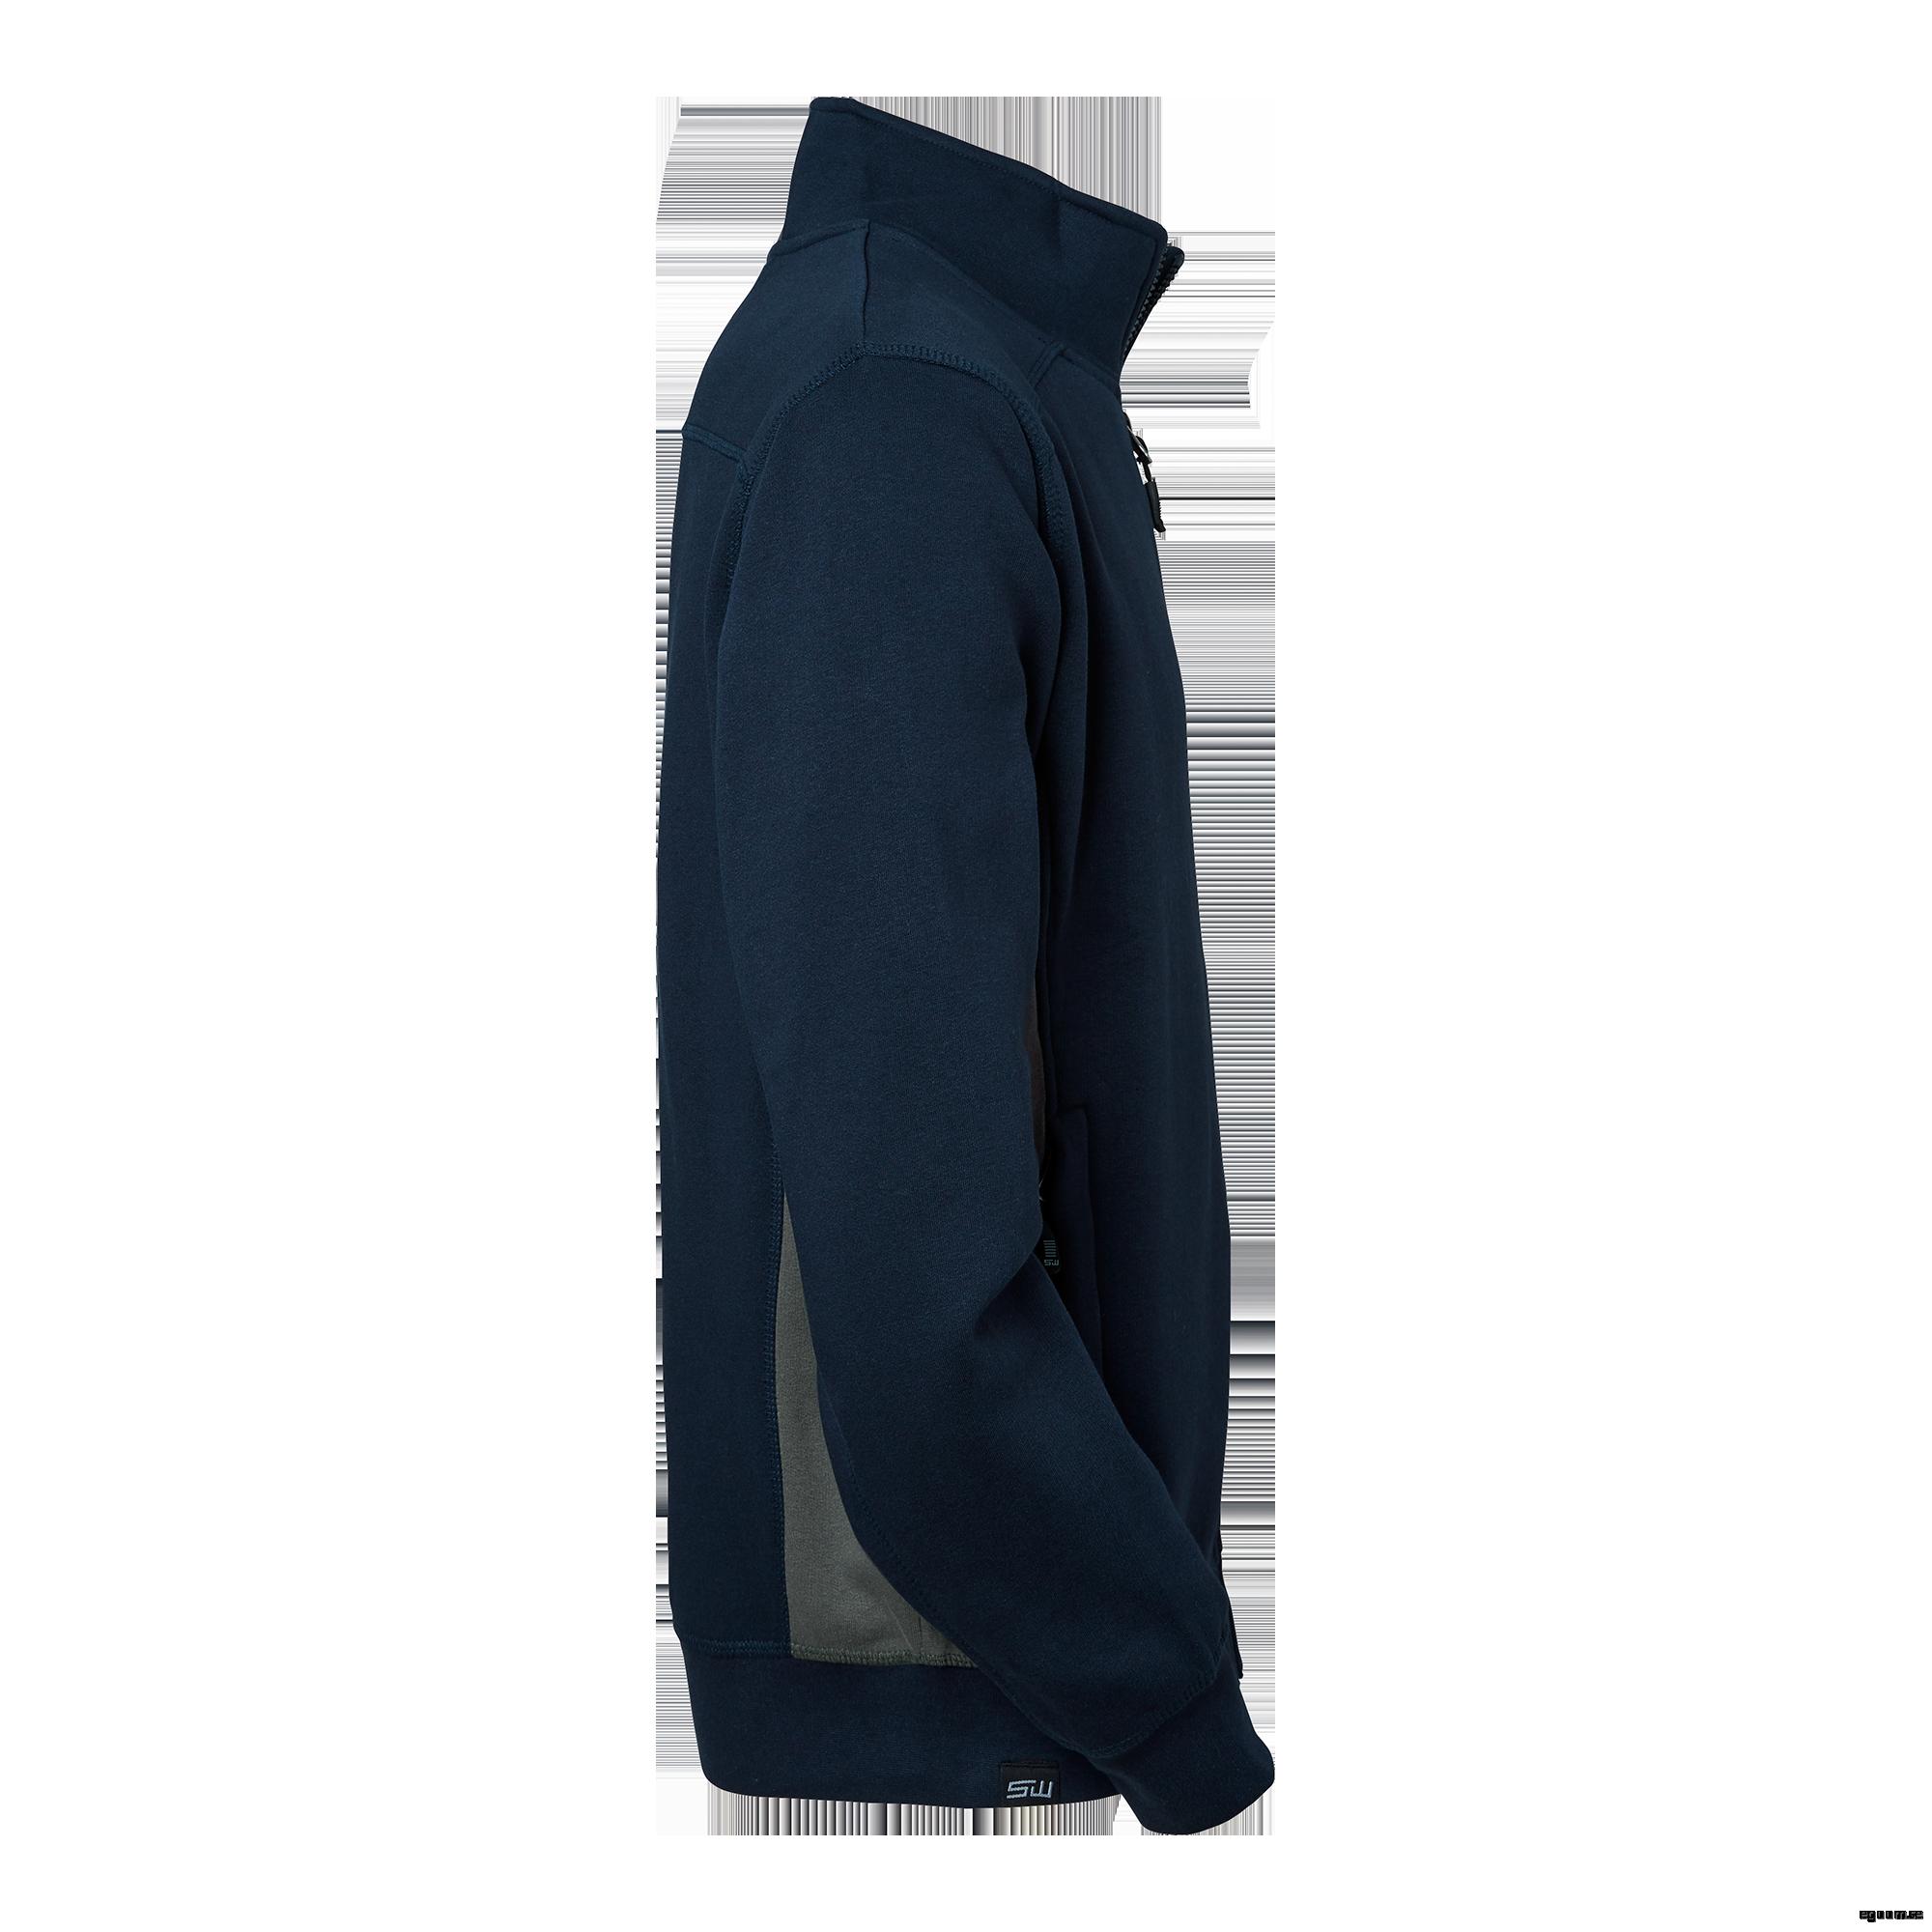 Navyblue/Grey